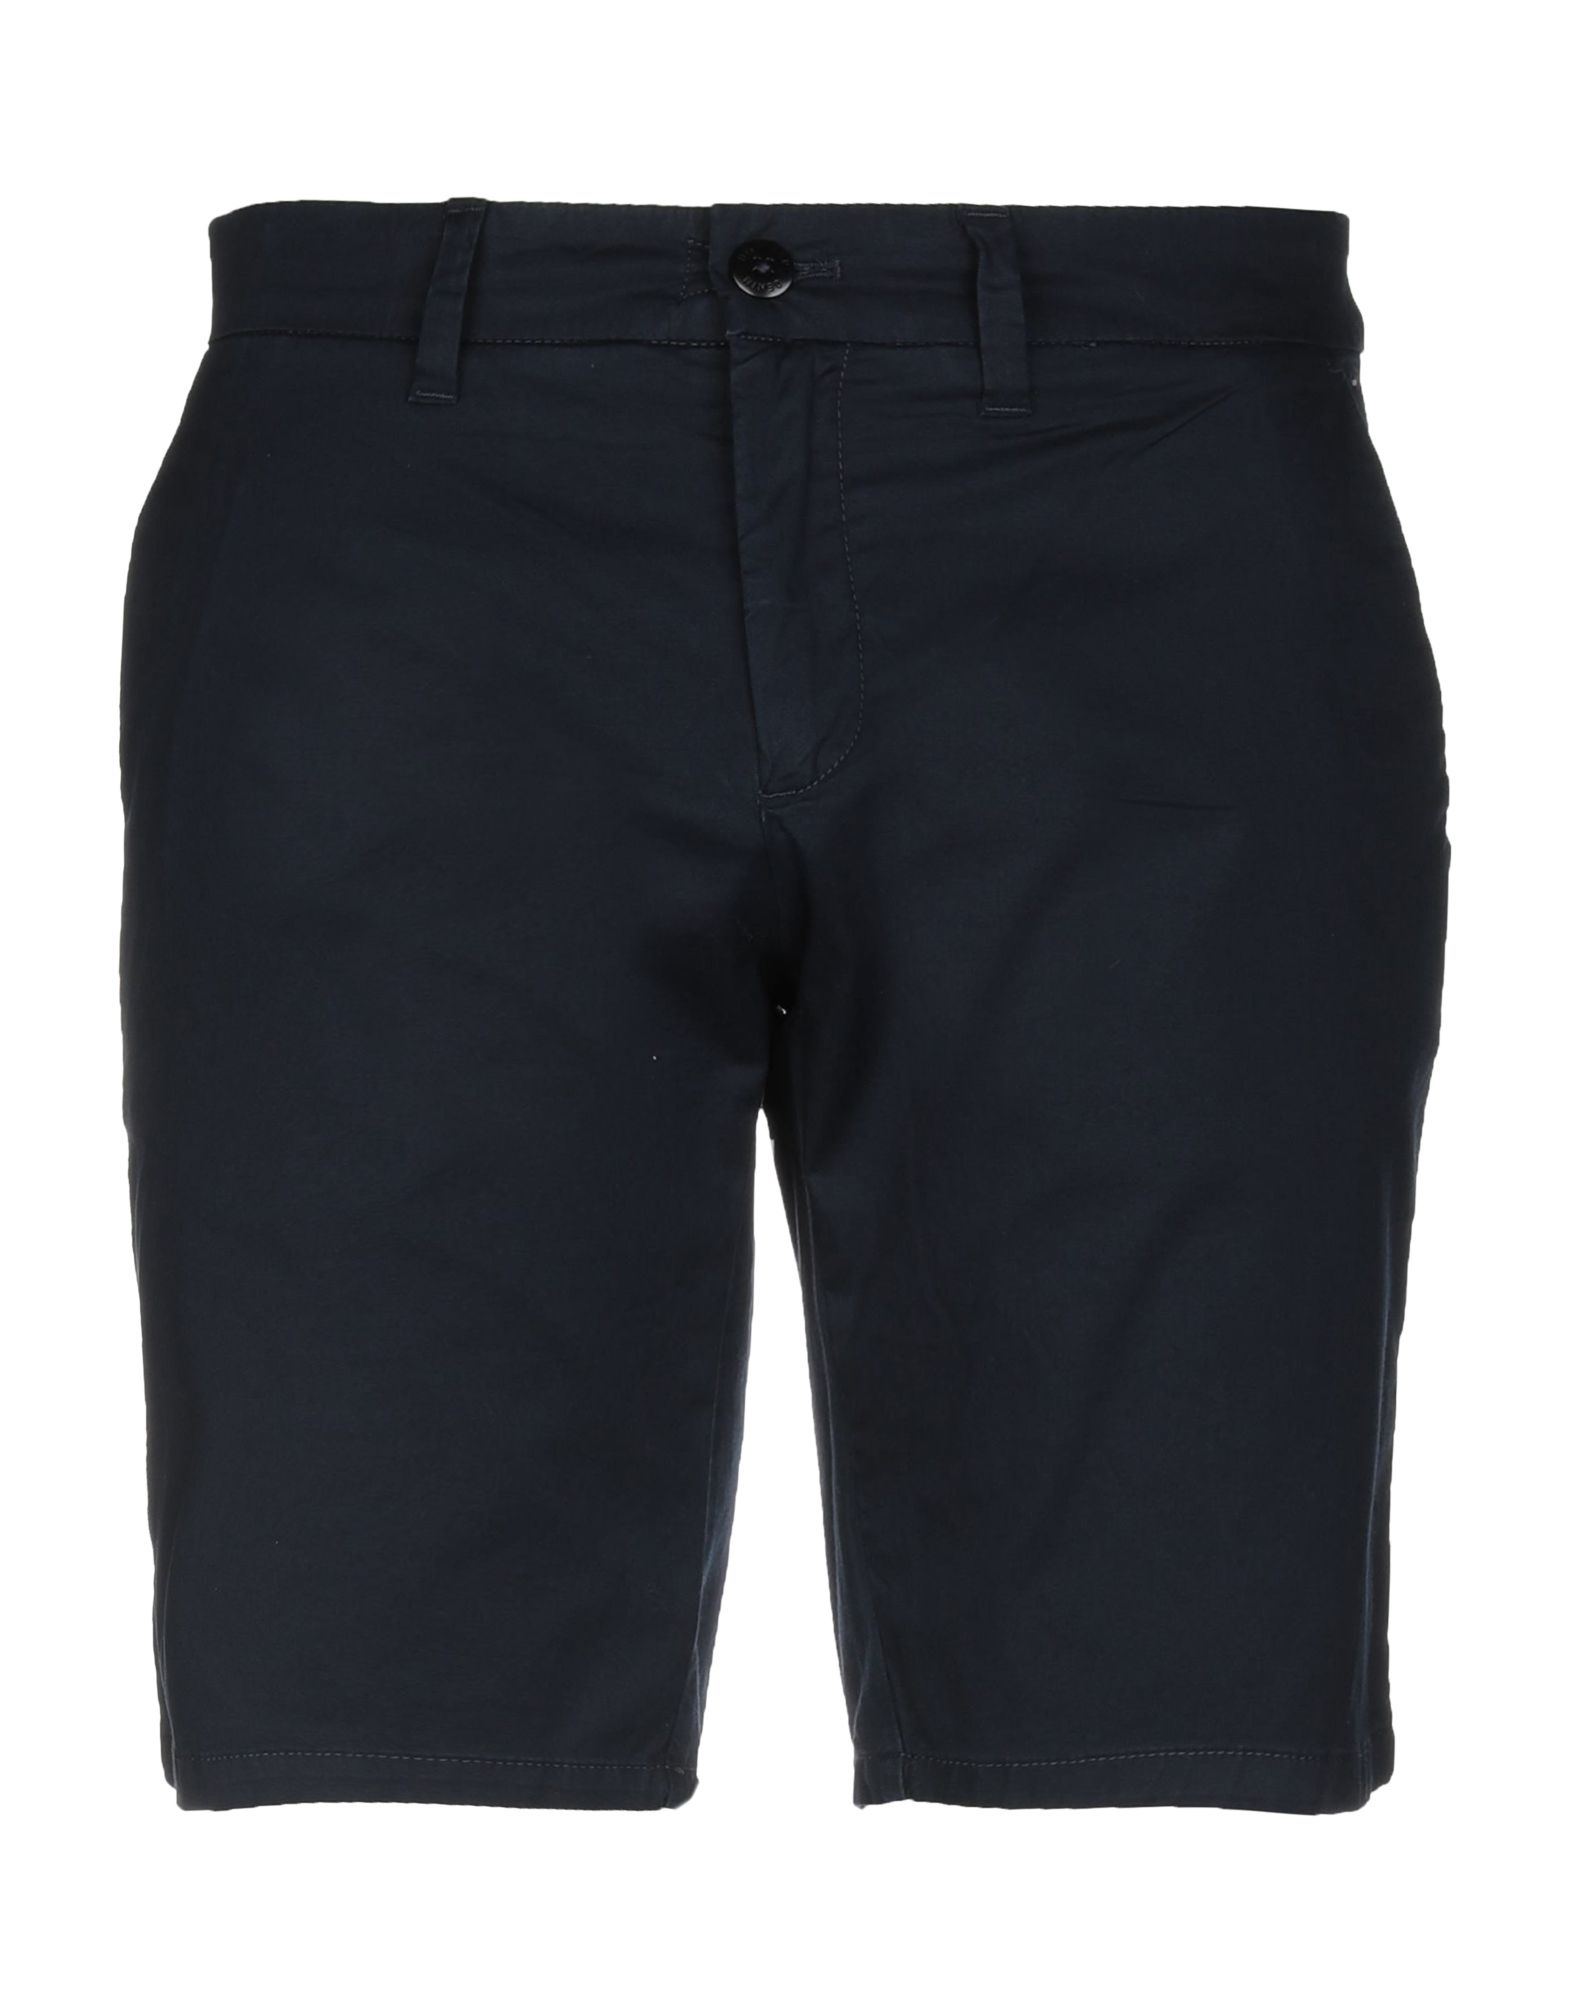 TOMMY JEANS Повседневные шорты шорты giulia шорты модель shorts mini jeans 01